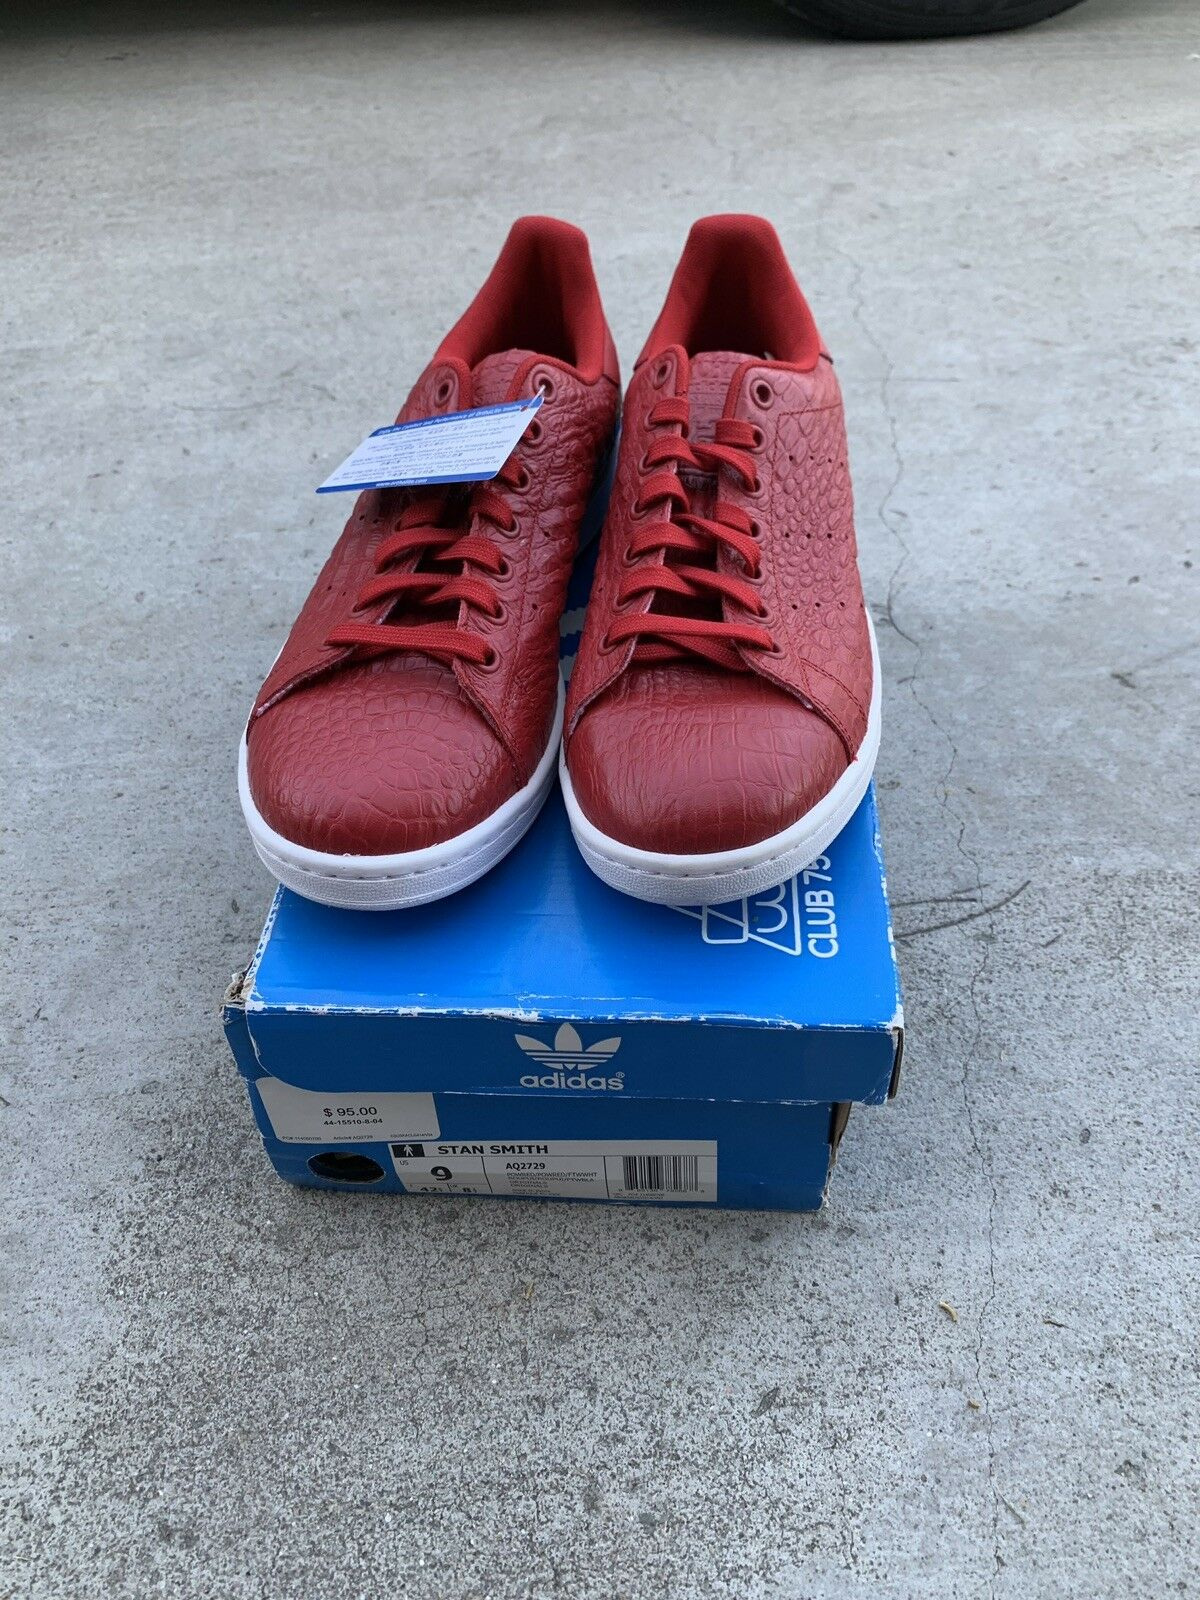 1081c0a1b54ba Adidas Stan Smith Red Size Size Size 9 AQ2729 Deadstock b13ec0 ...